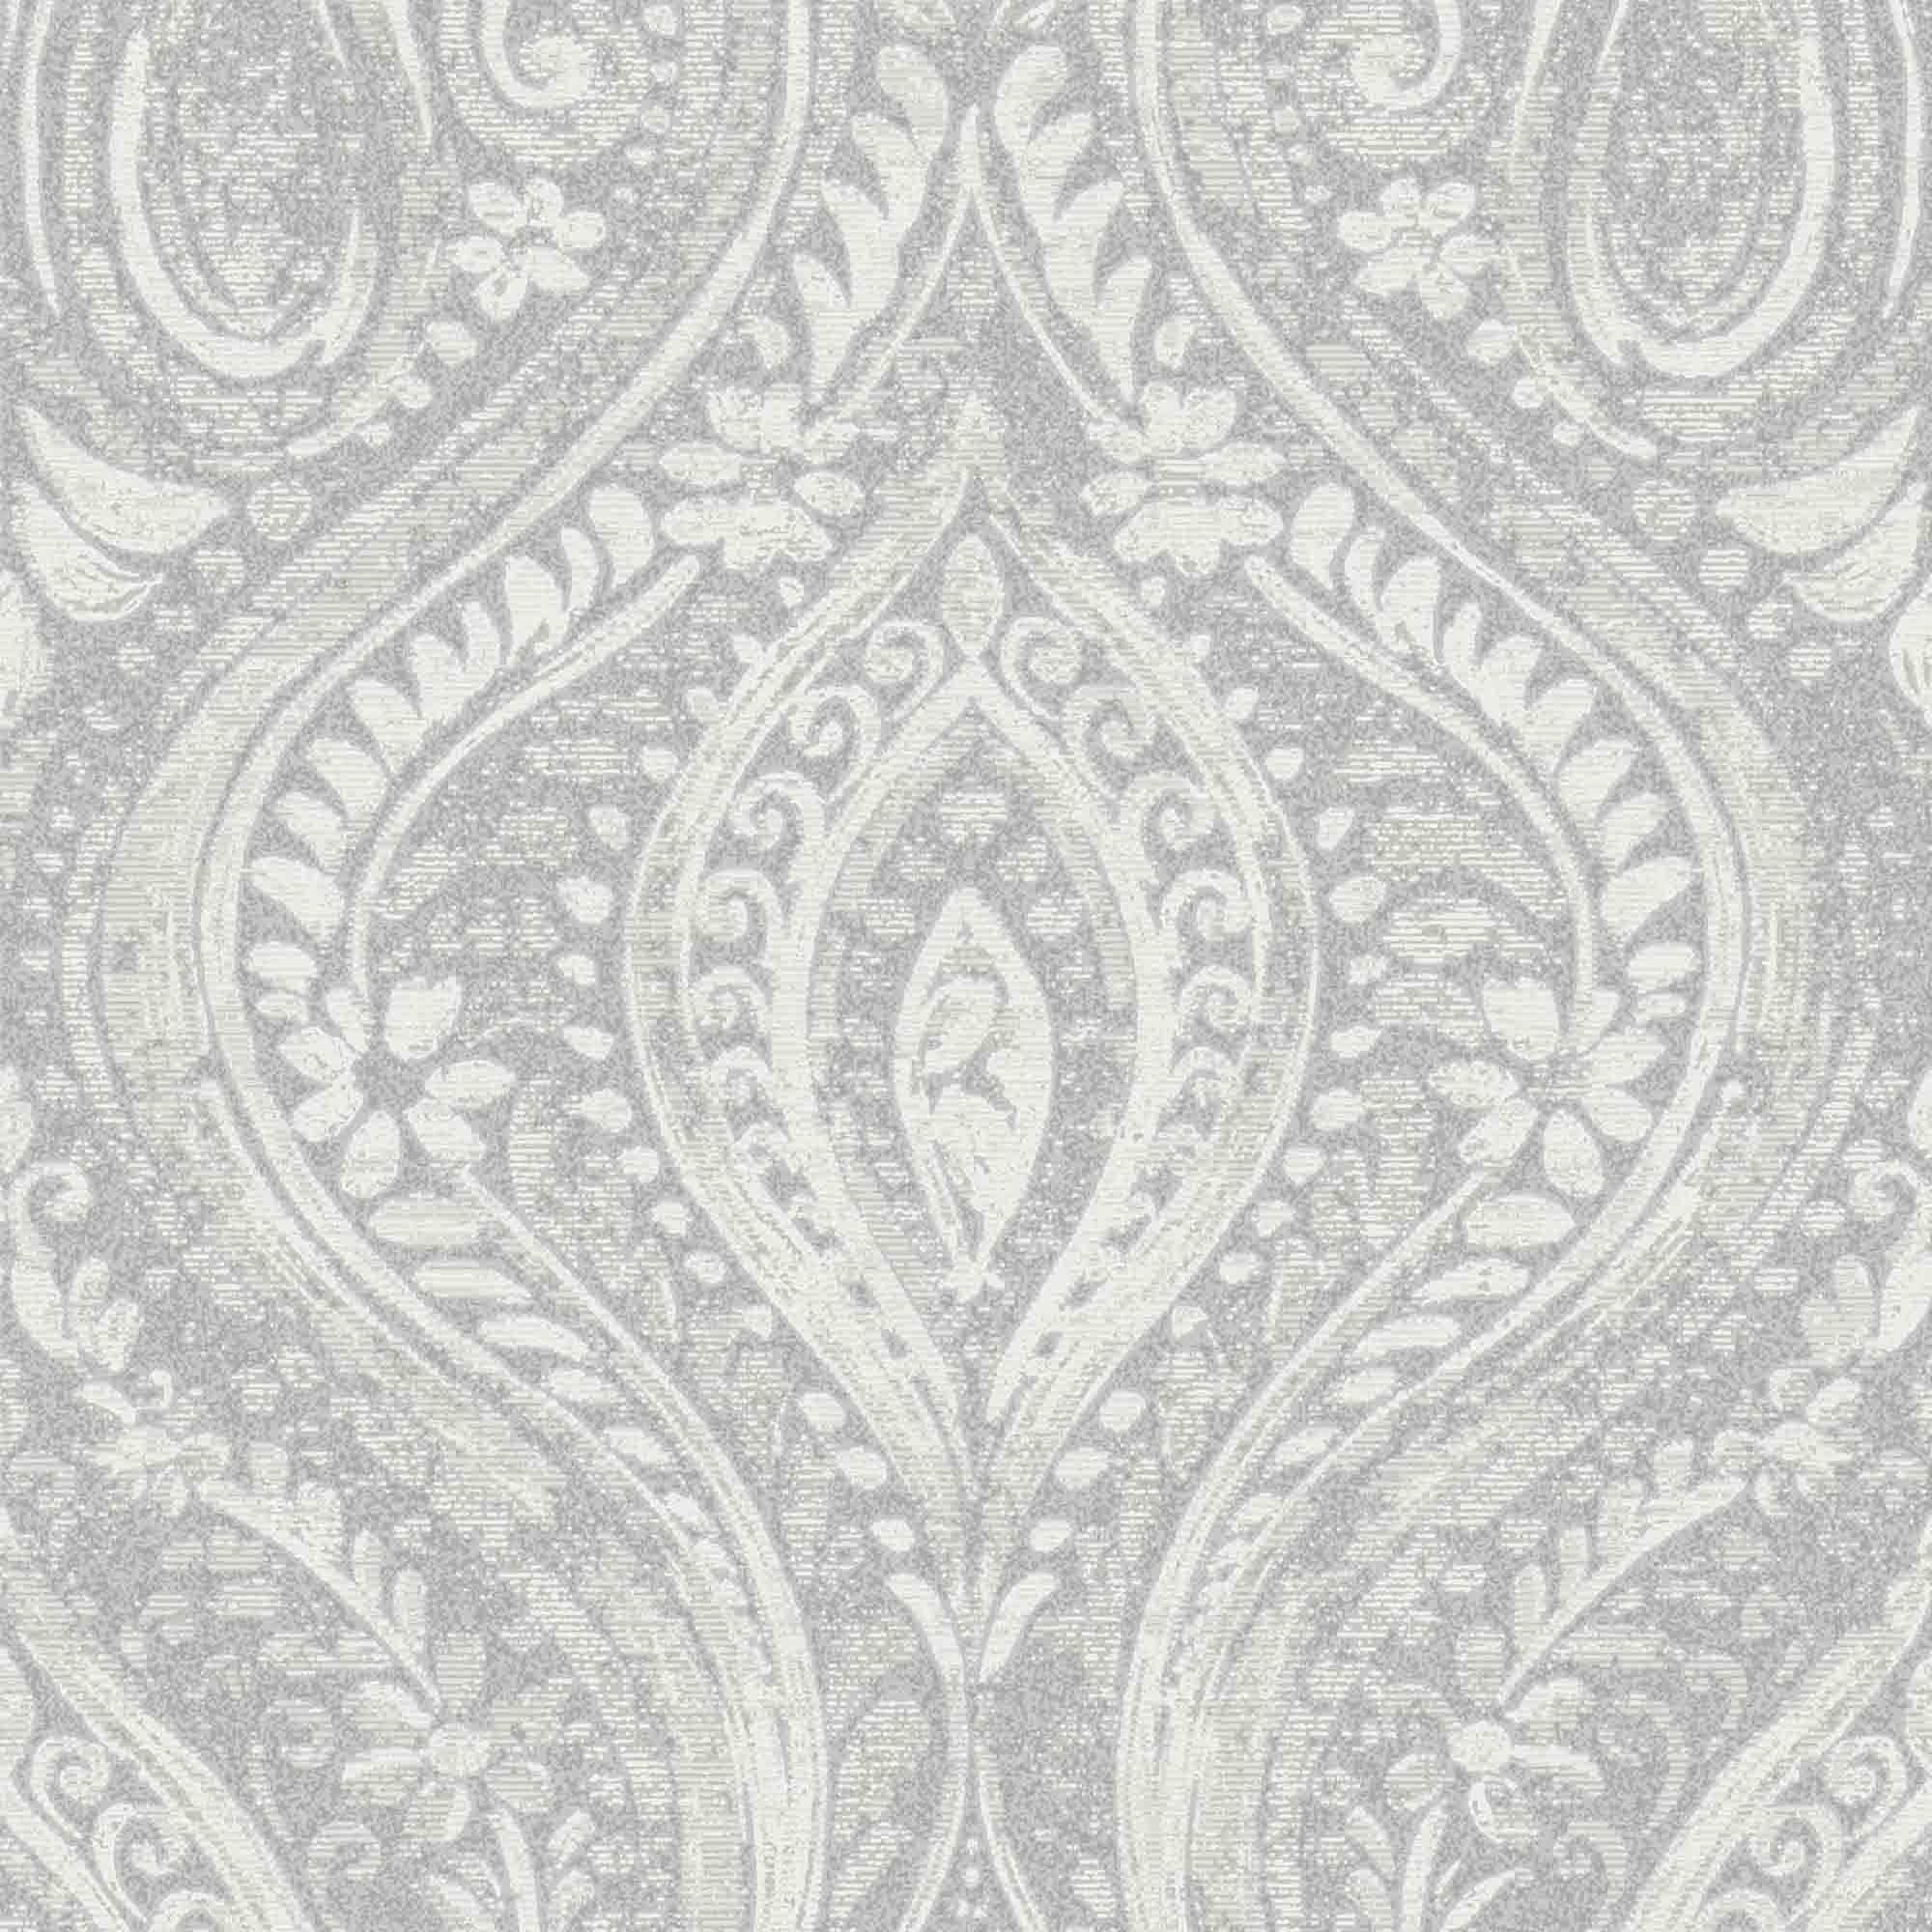 gold anoushka grey damask sheen wallpaper departments. Black Bedroom Furniture Sets. Home Design Ideas